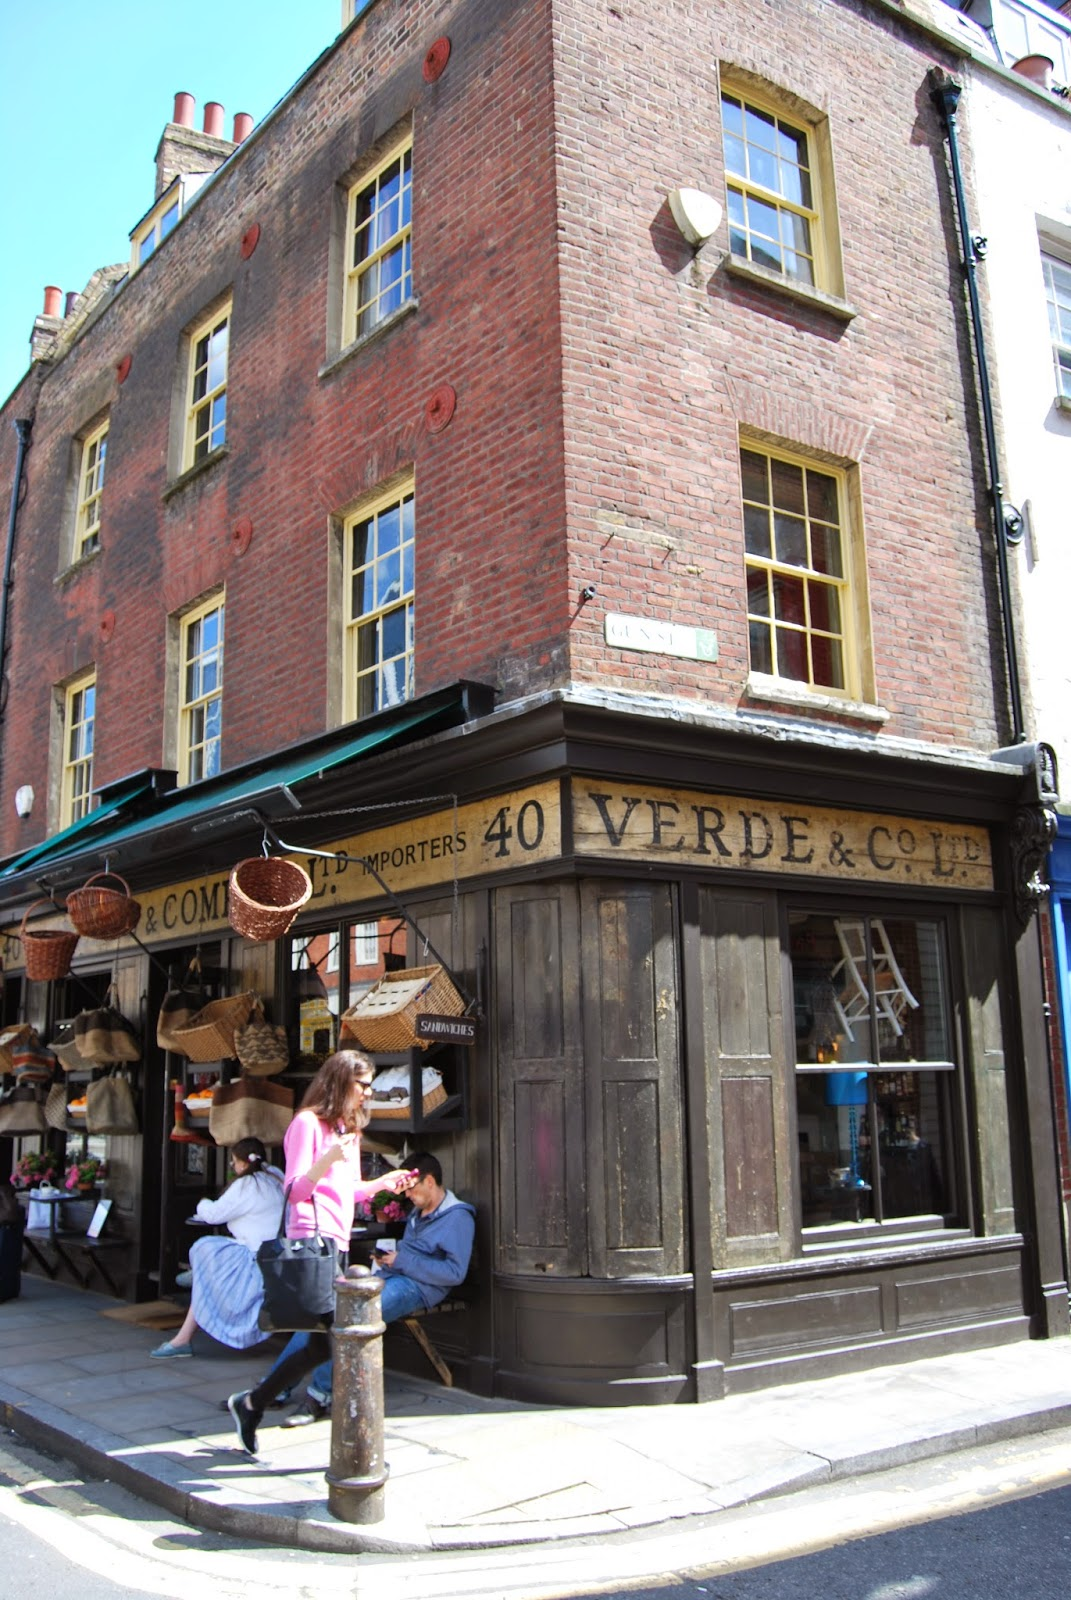 Spitalfields London: Spitalfields Market, Modern Architecture And A Monument In